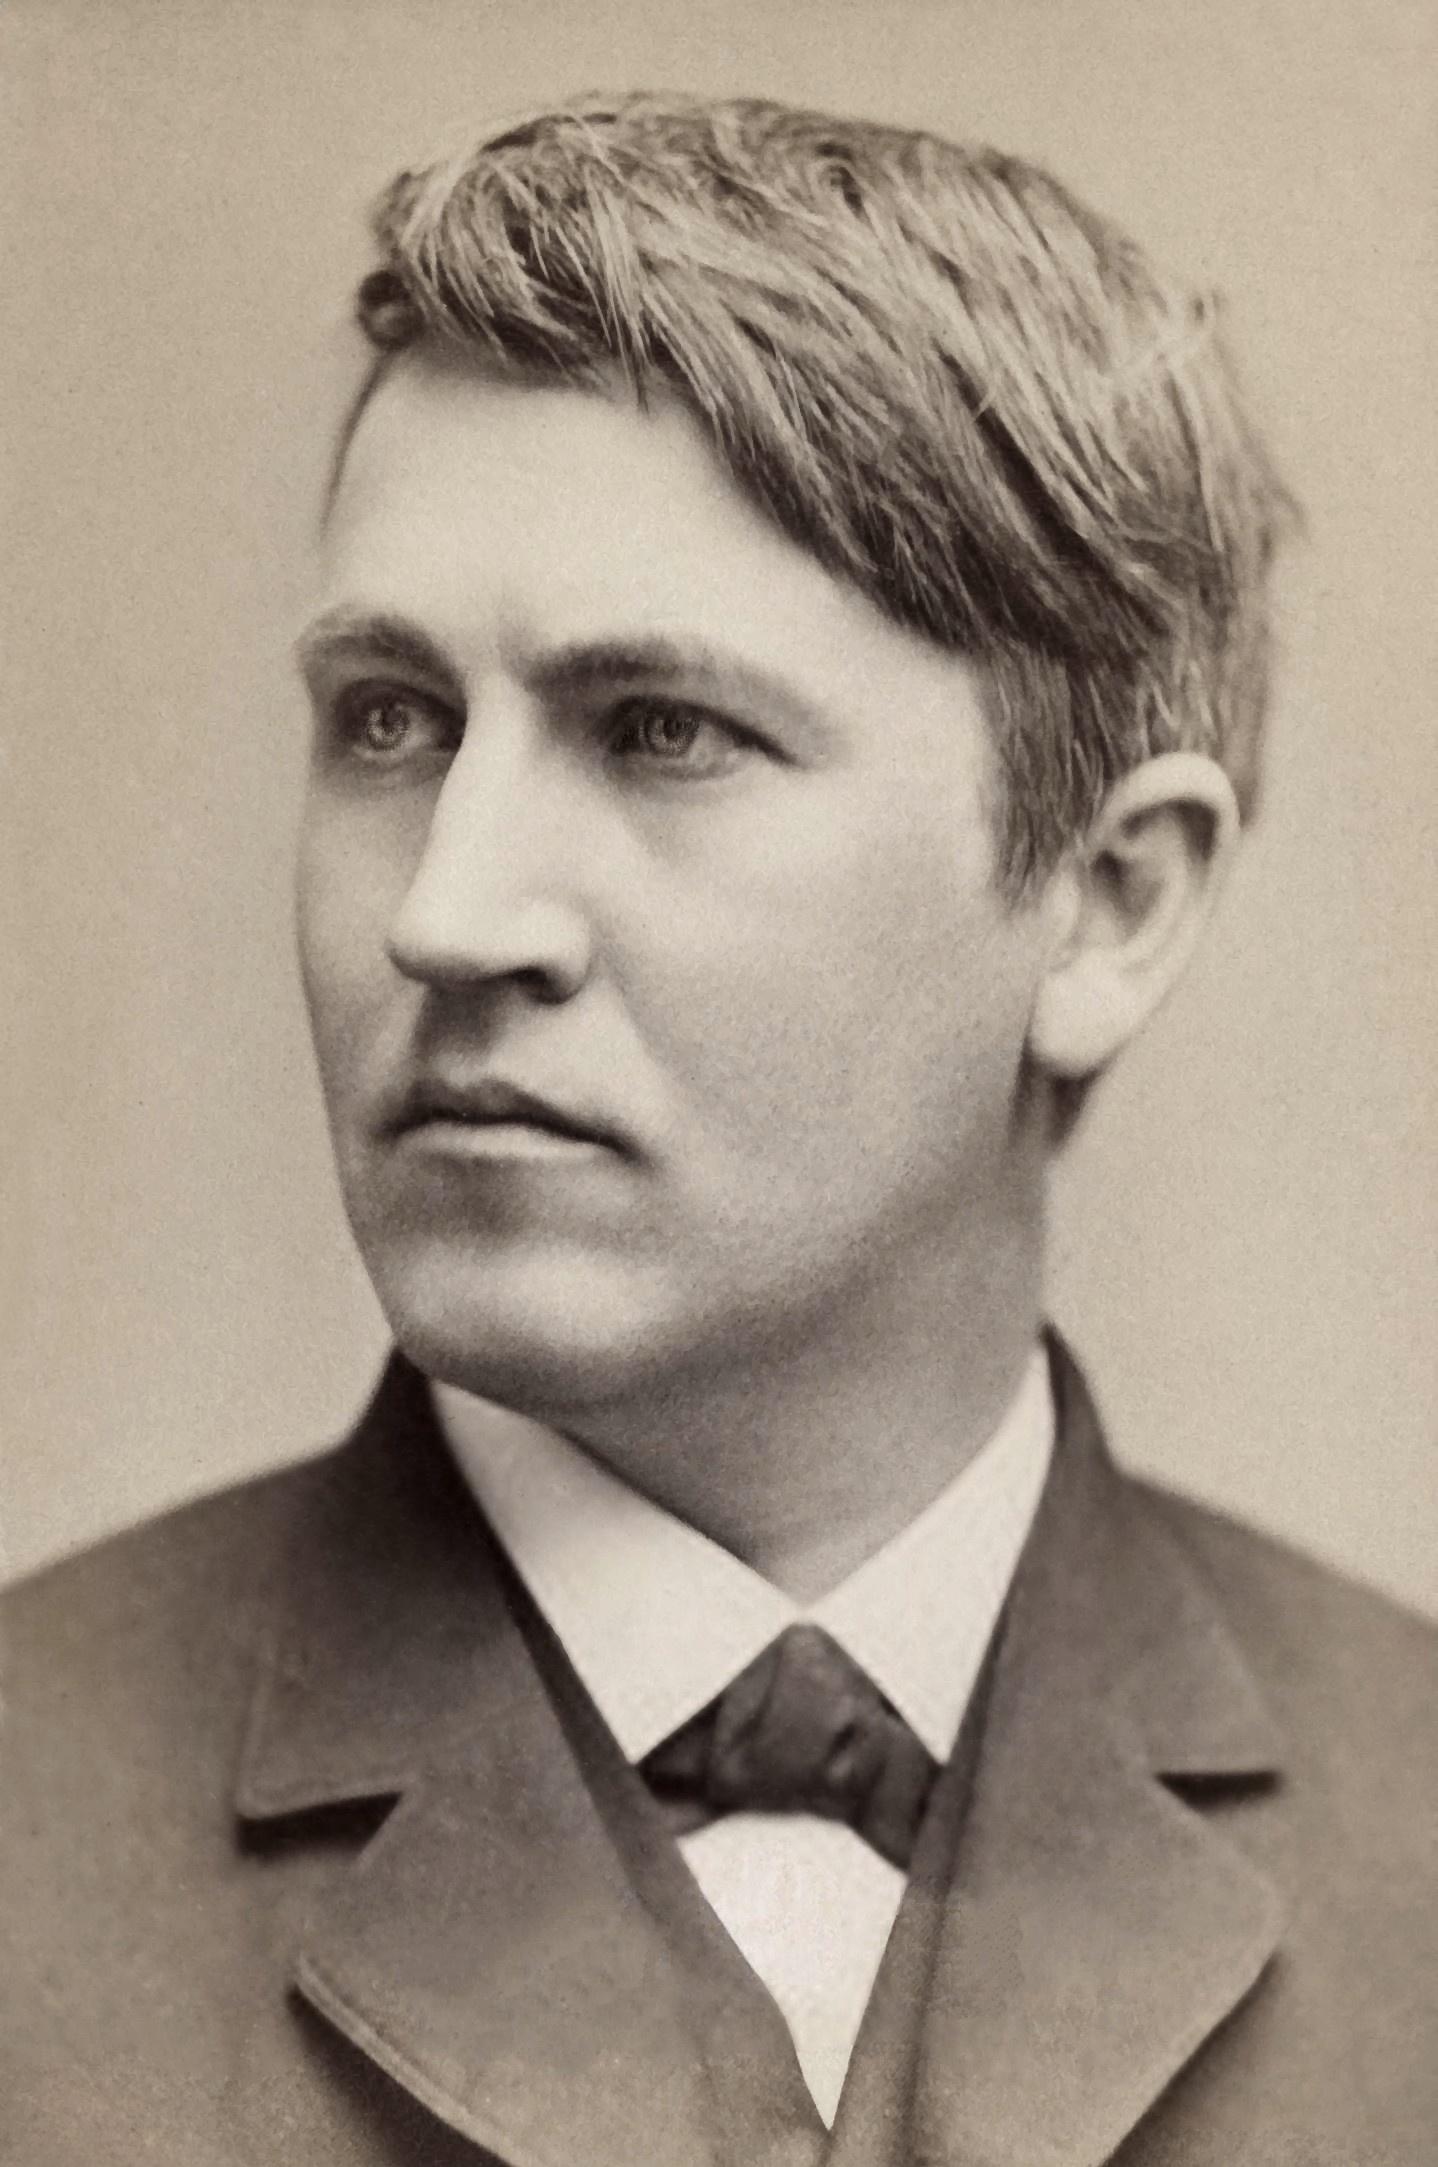 Thomas Alva Edison in 1878